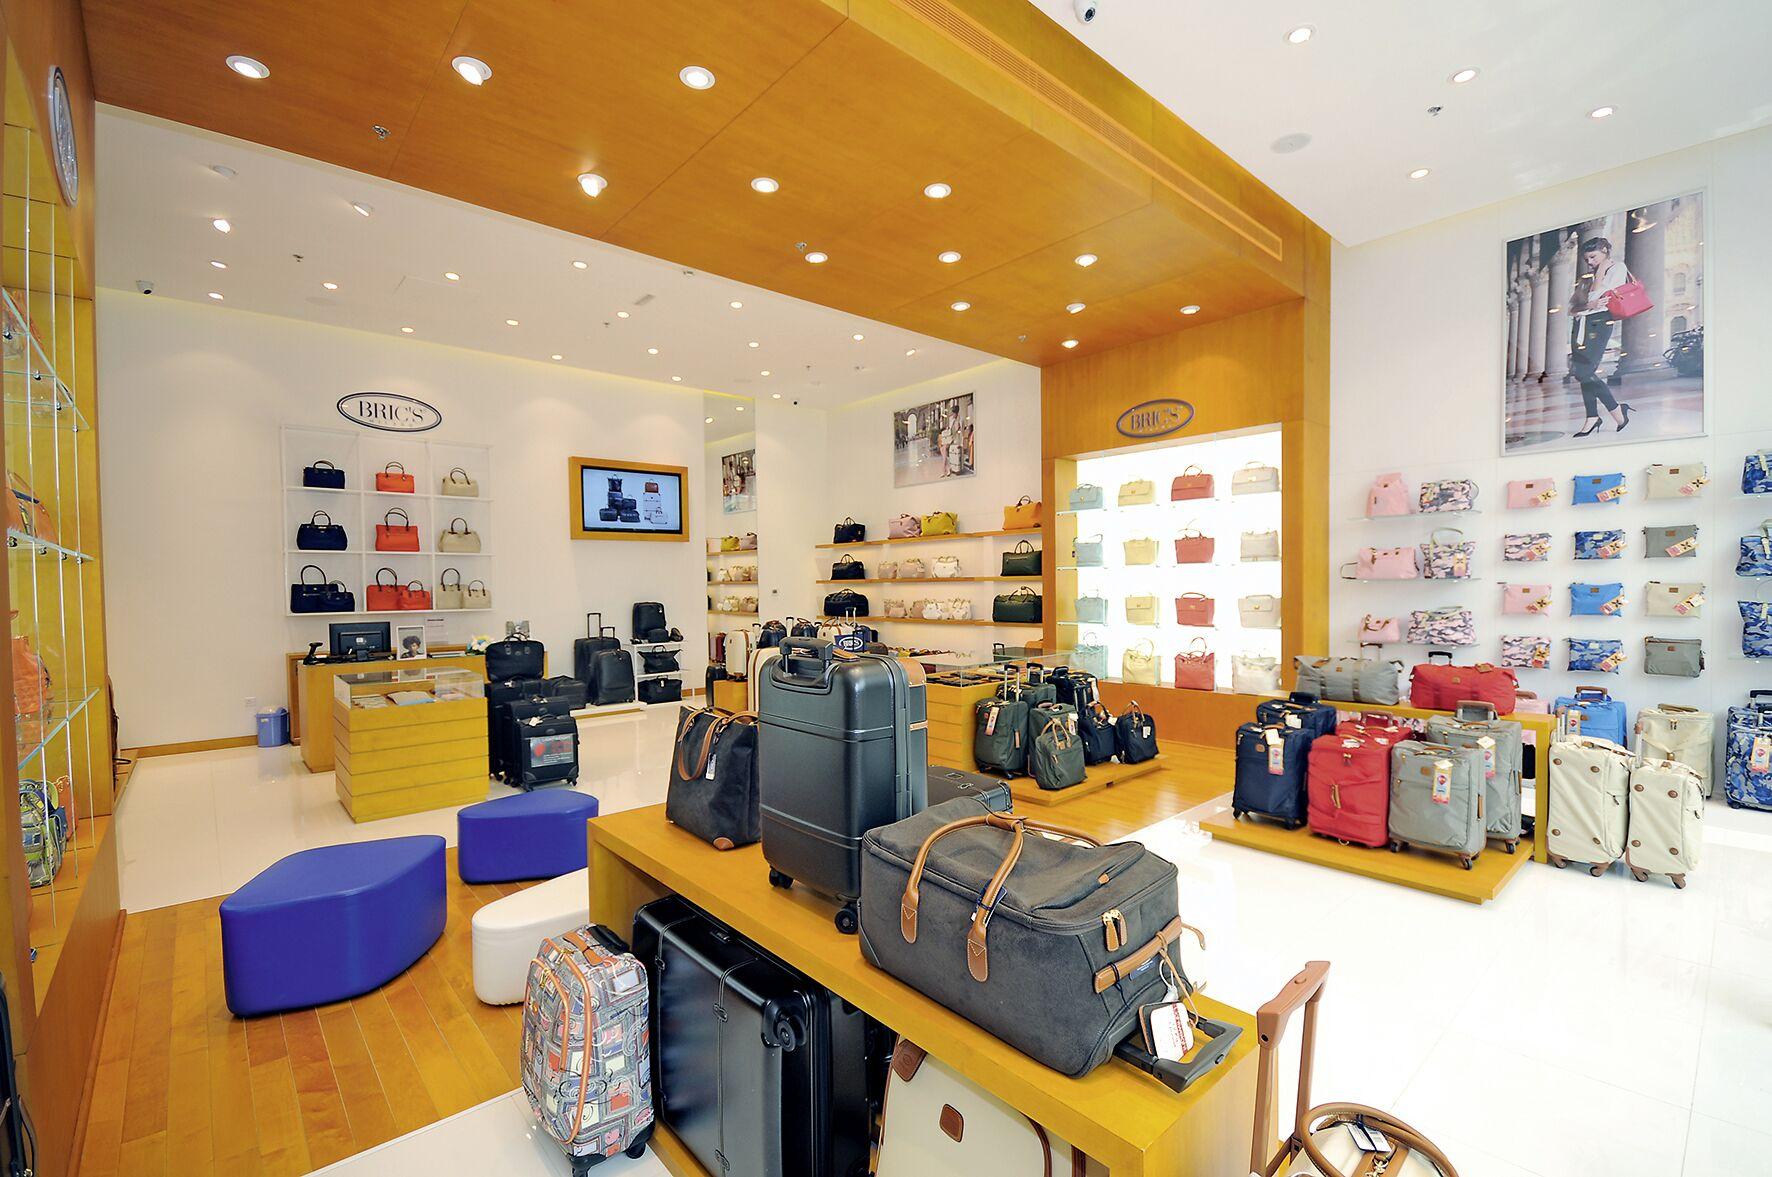 BRIC'S Luggage Store